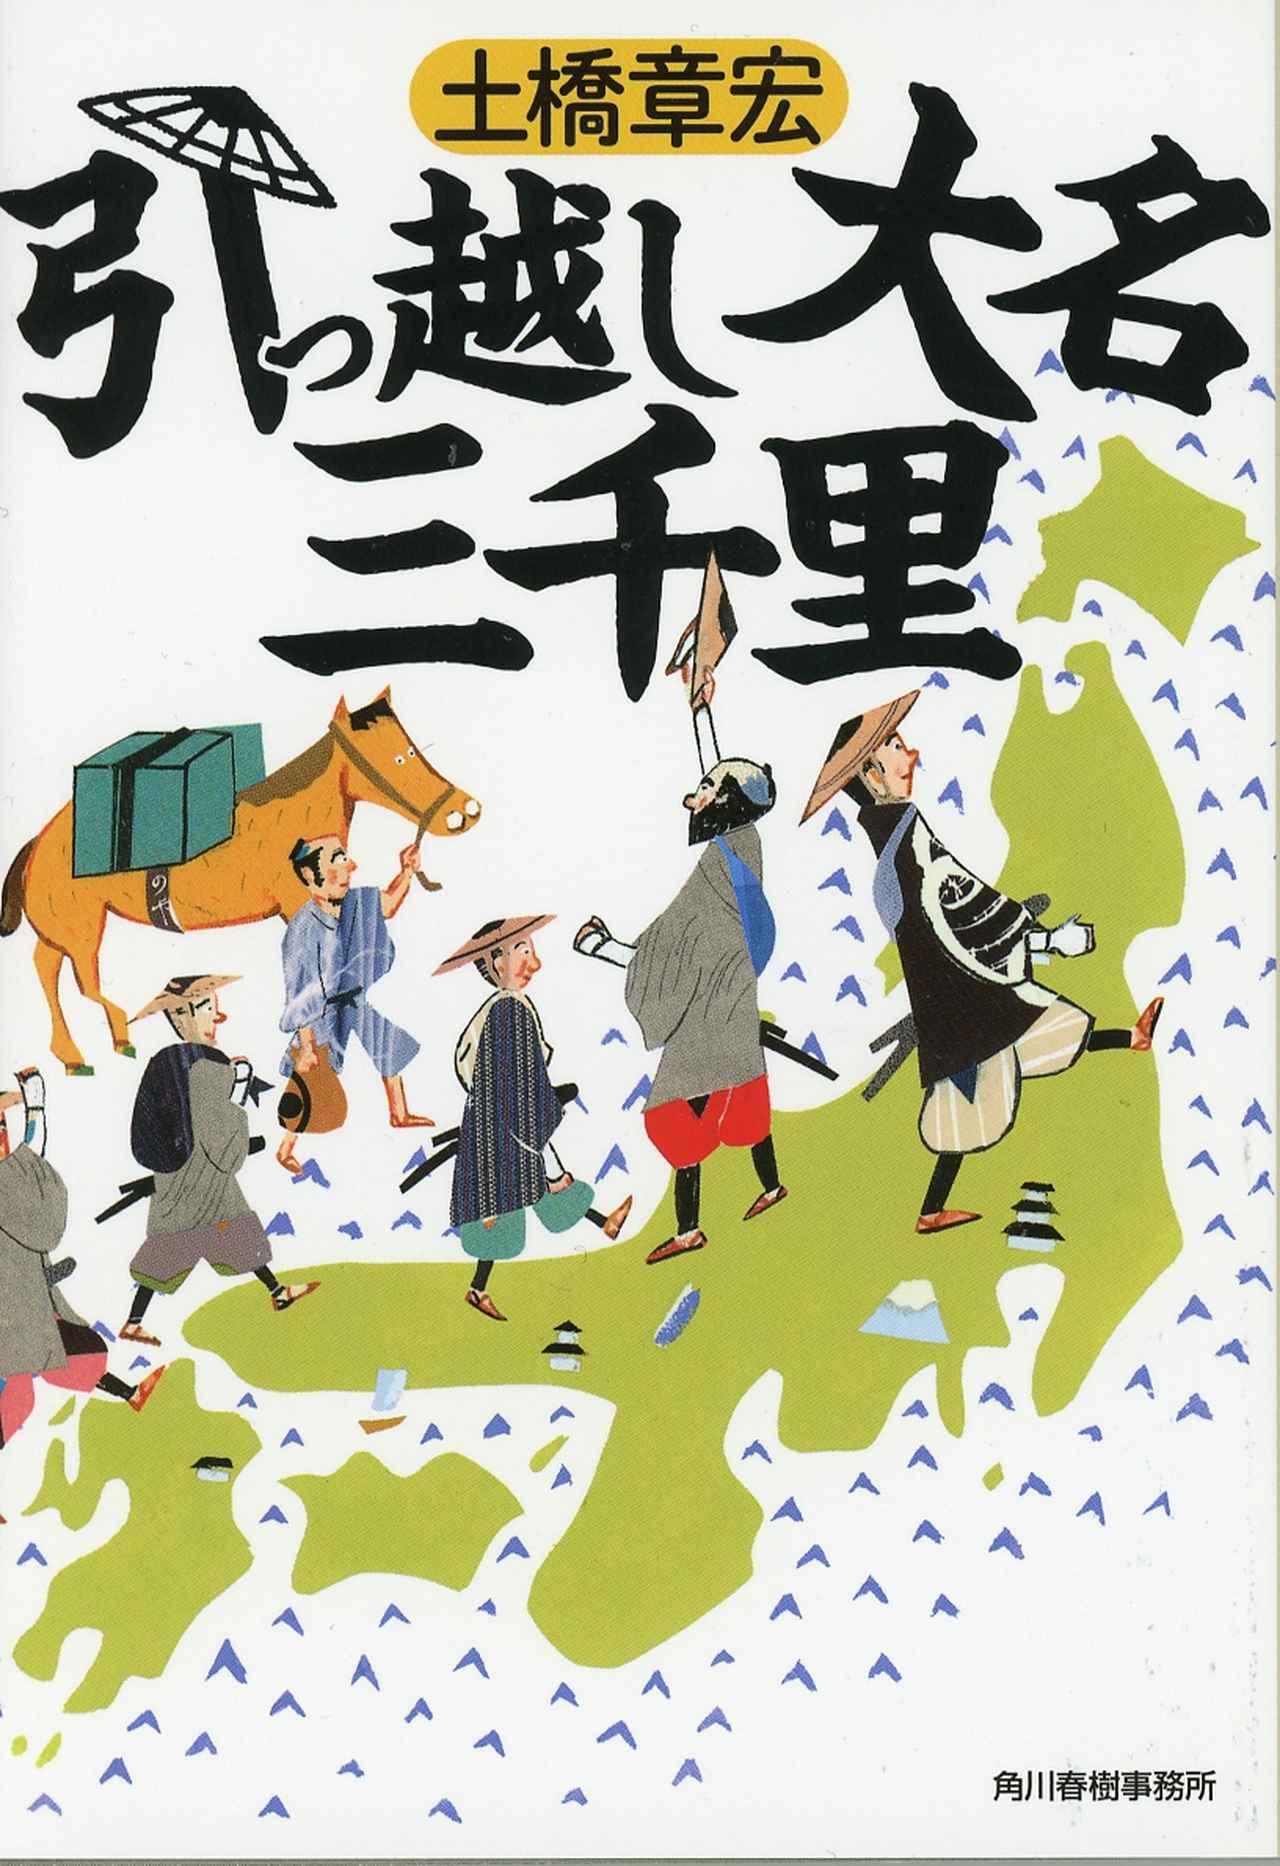 画像: 土橋章宏「引っ越し大名三千里」(ハルキ文庫 刊)